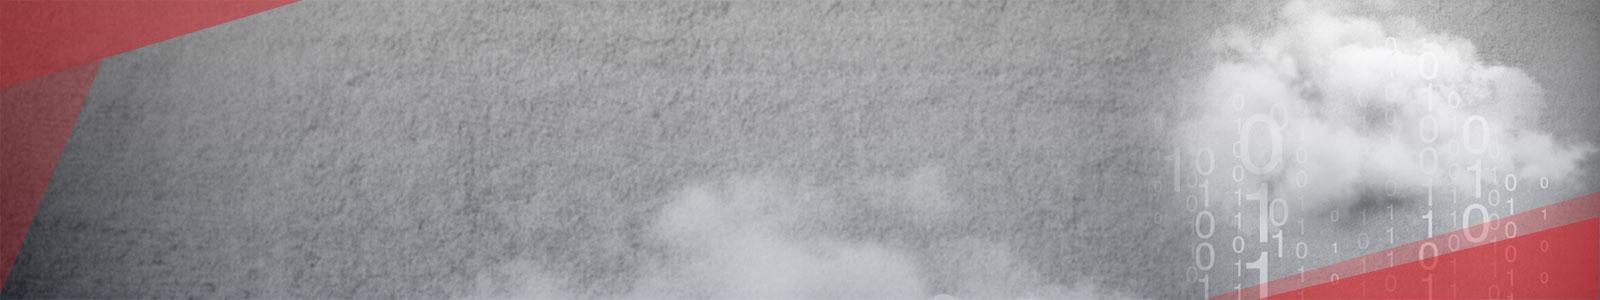 Emagia-Cloud-banner